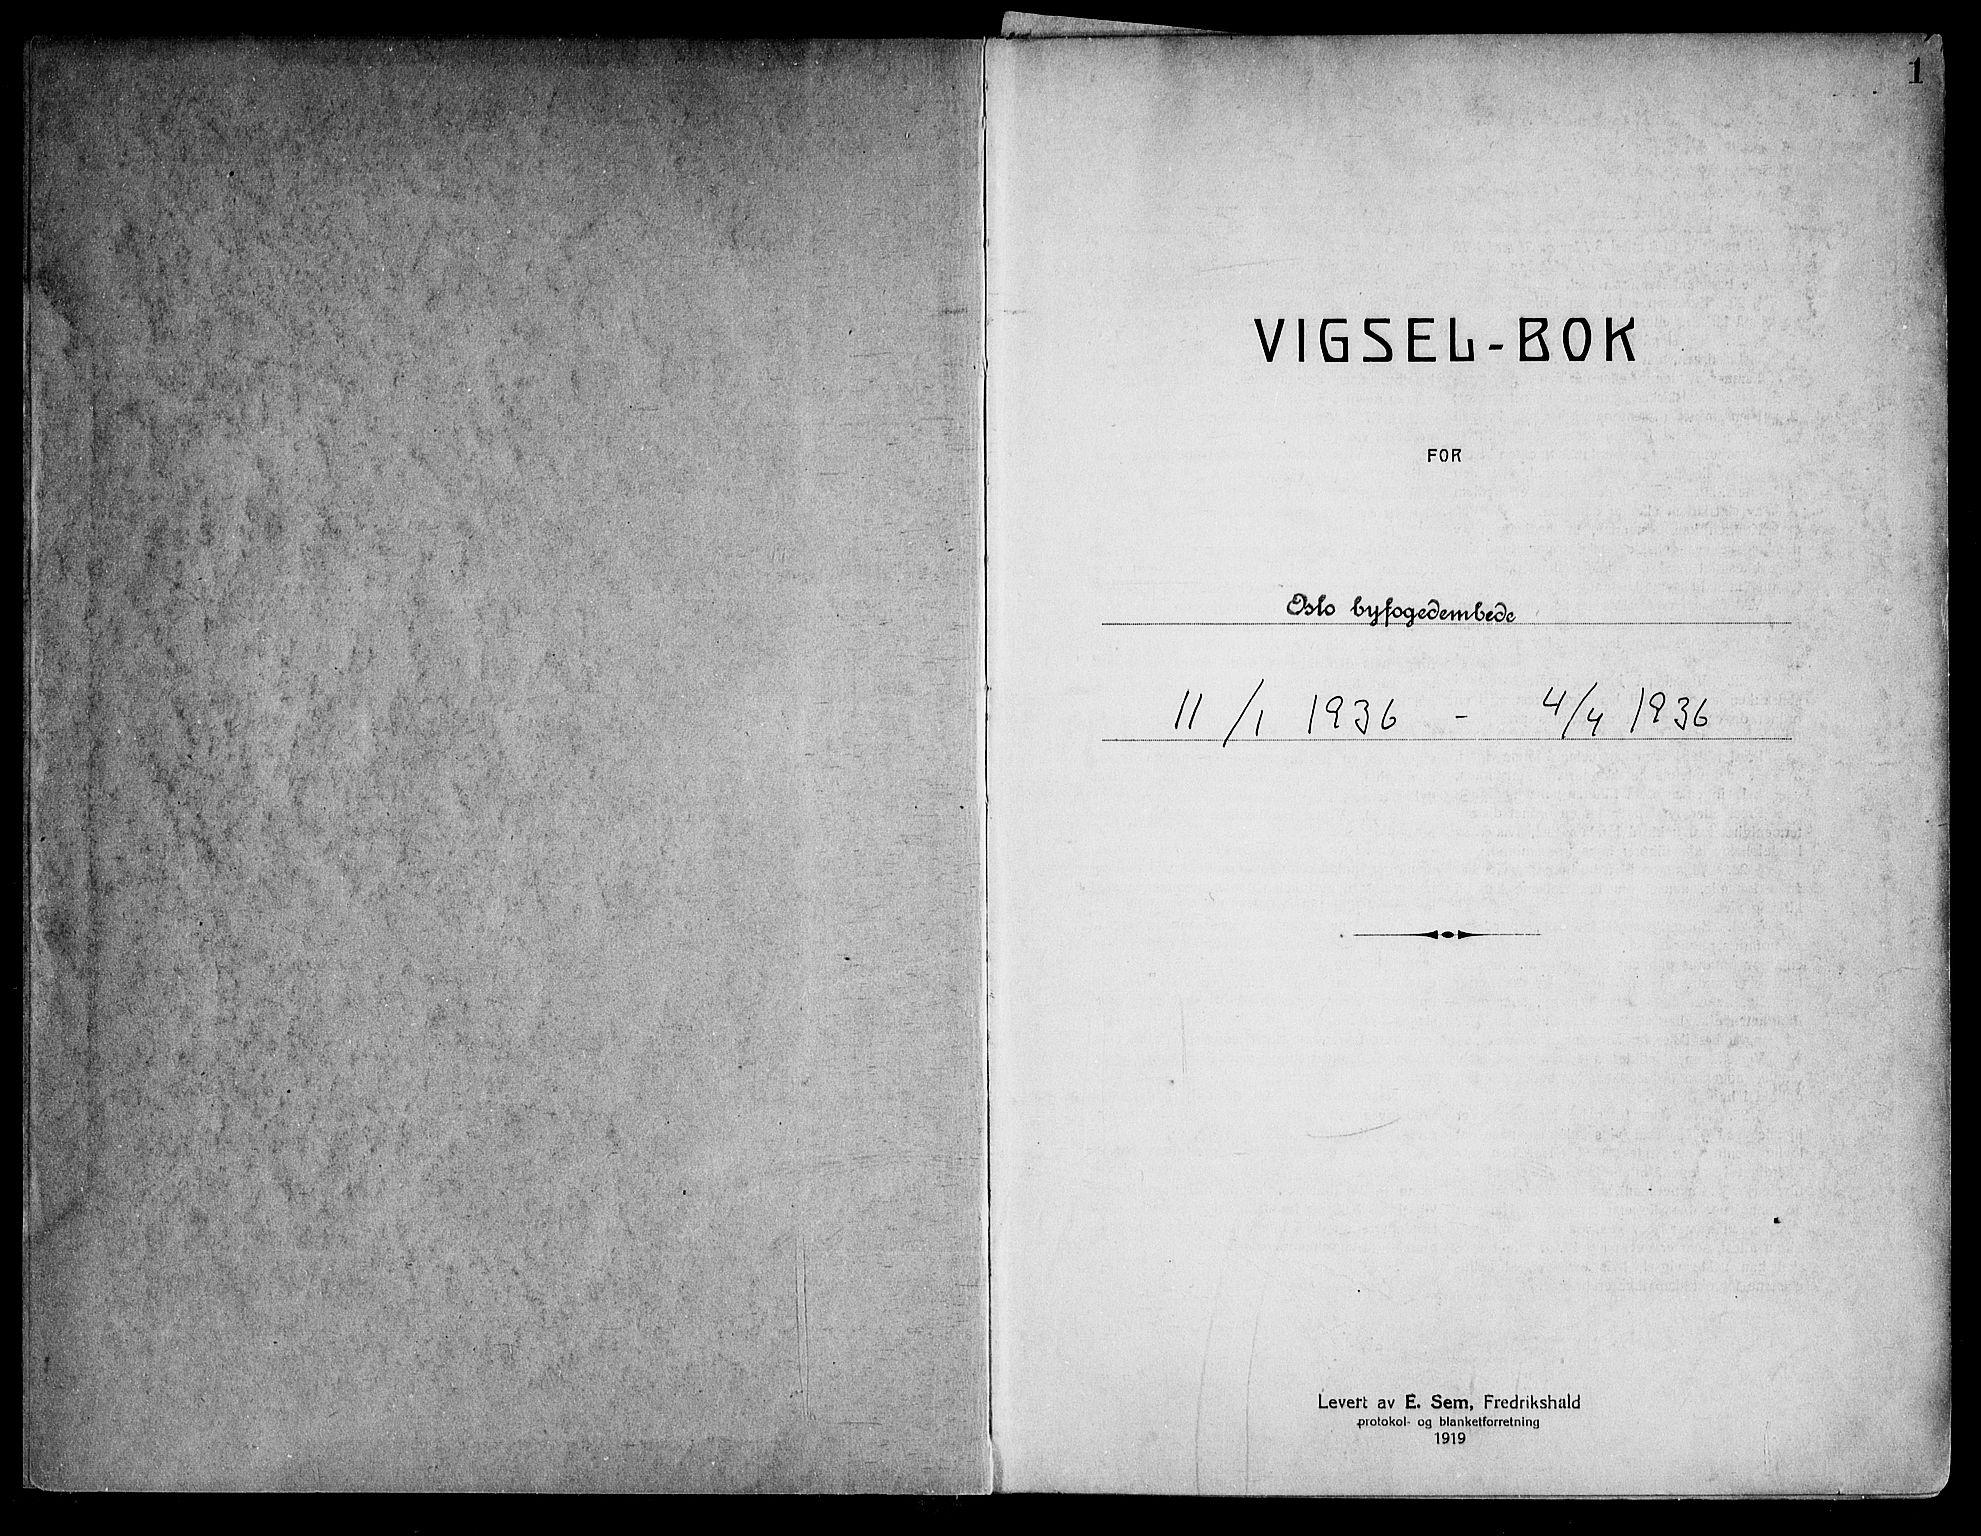 SAO, Oslo byfogd avd. I, L/Lb/Lbb/L0026: Notarialprotokoll, rekke II: Vigsler, 1936, s. 1a